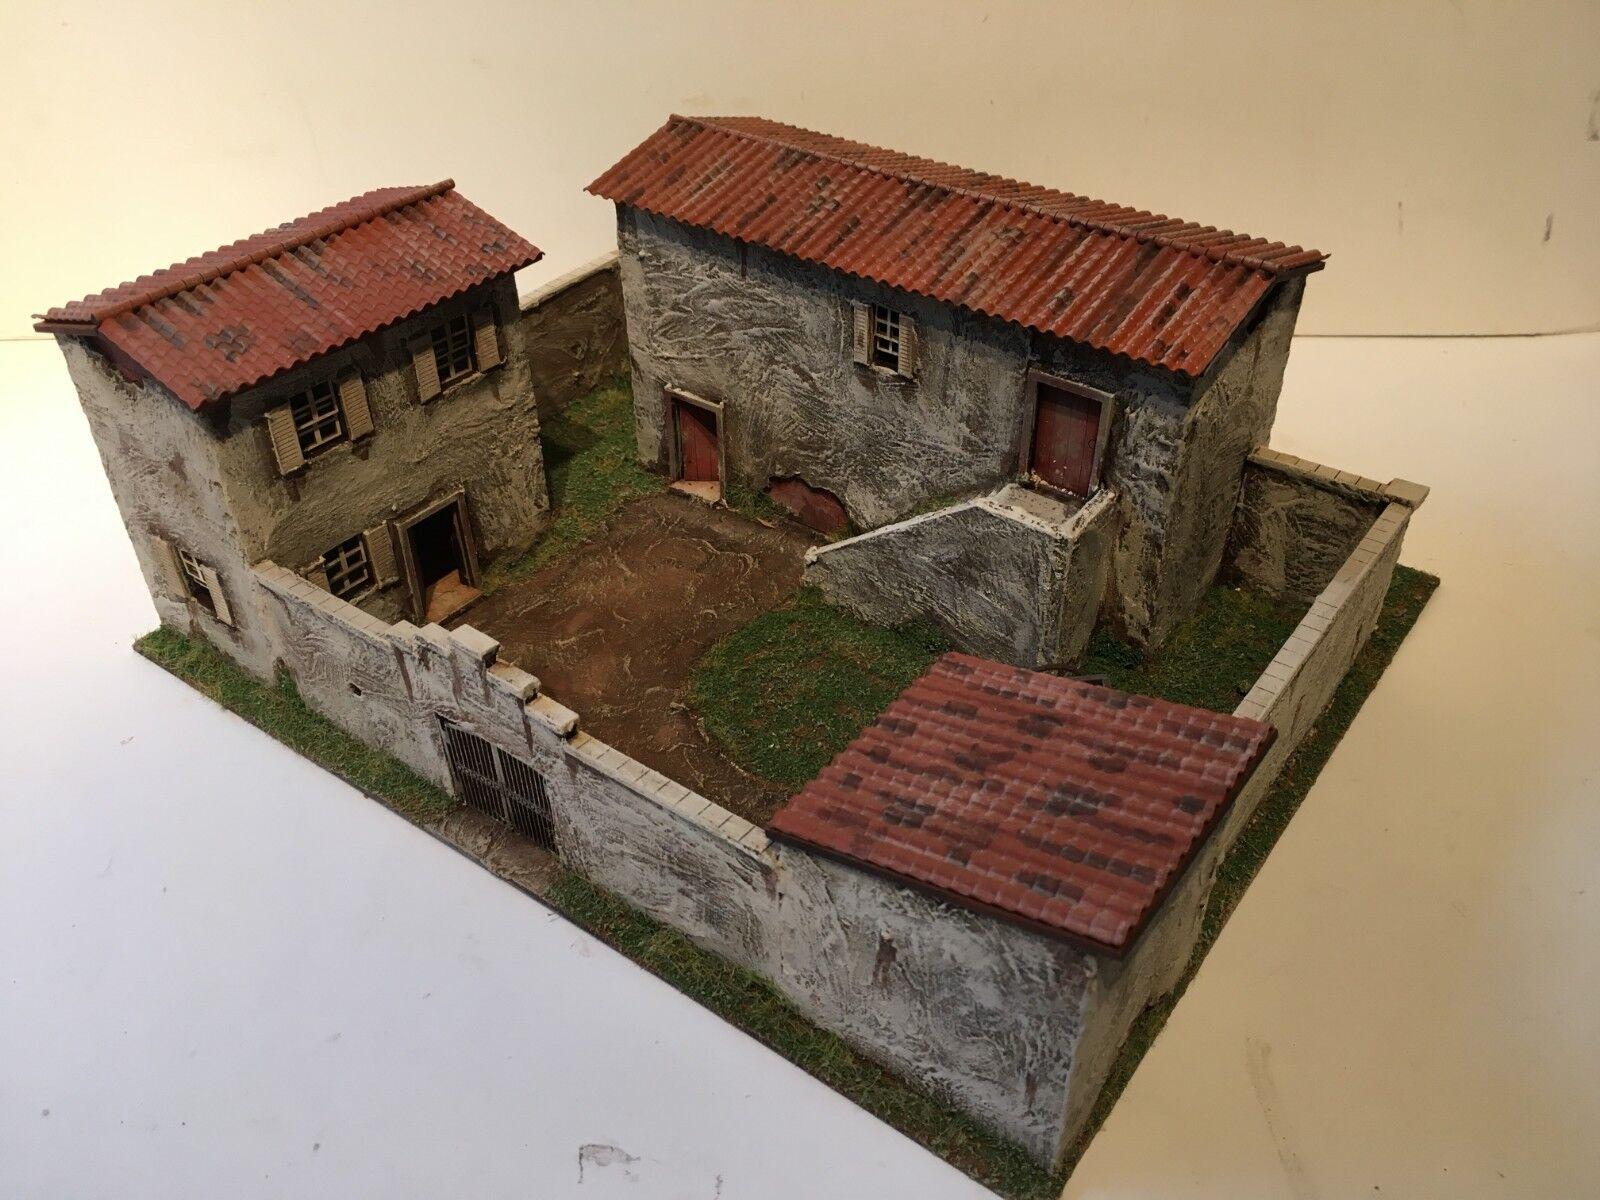 28mm Spanish Italian Villa model 'Commission'